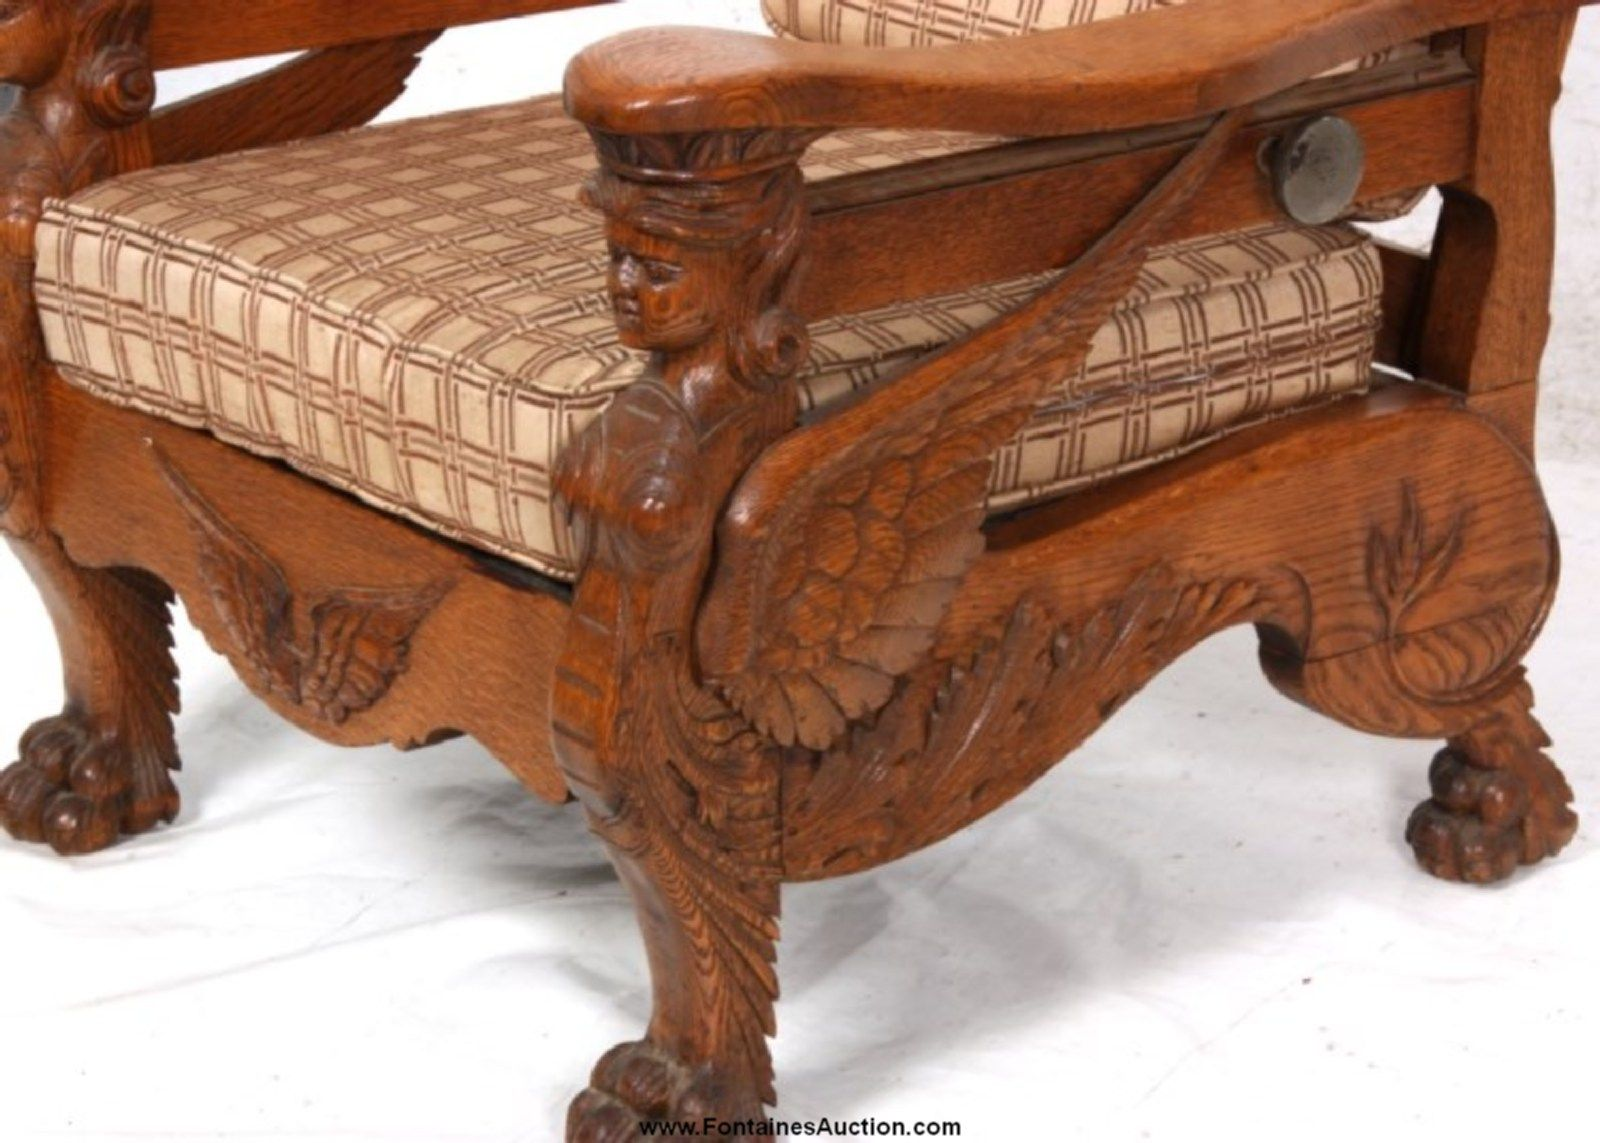 Antique morris chair - 13 Figural Carved Oak Morris Chair